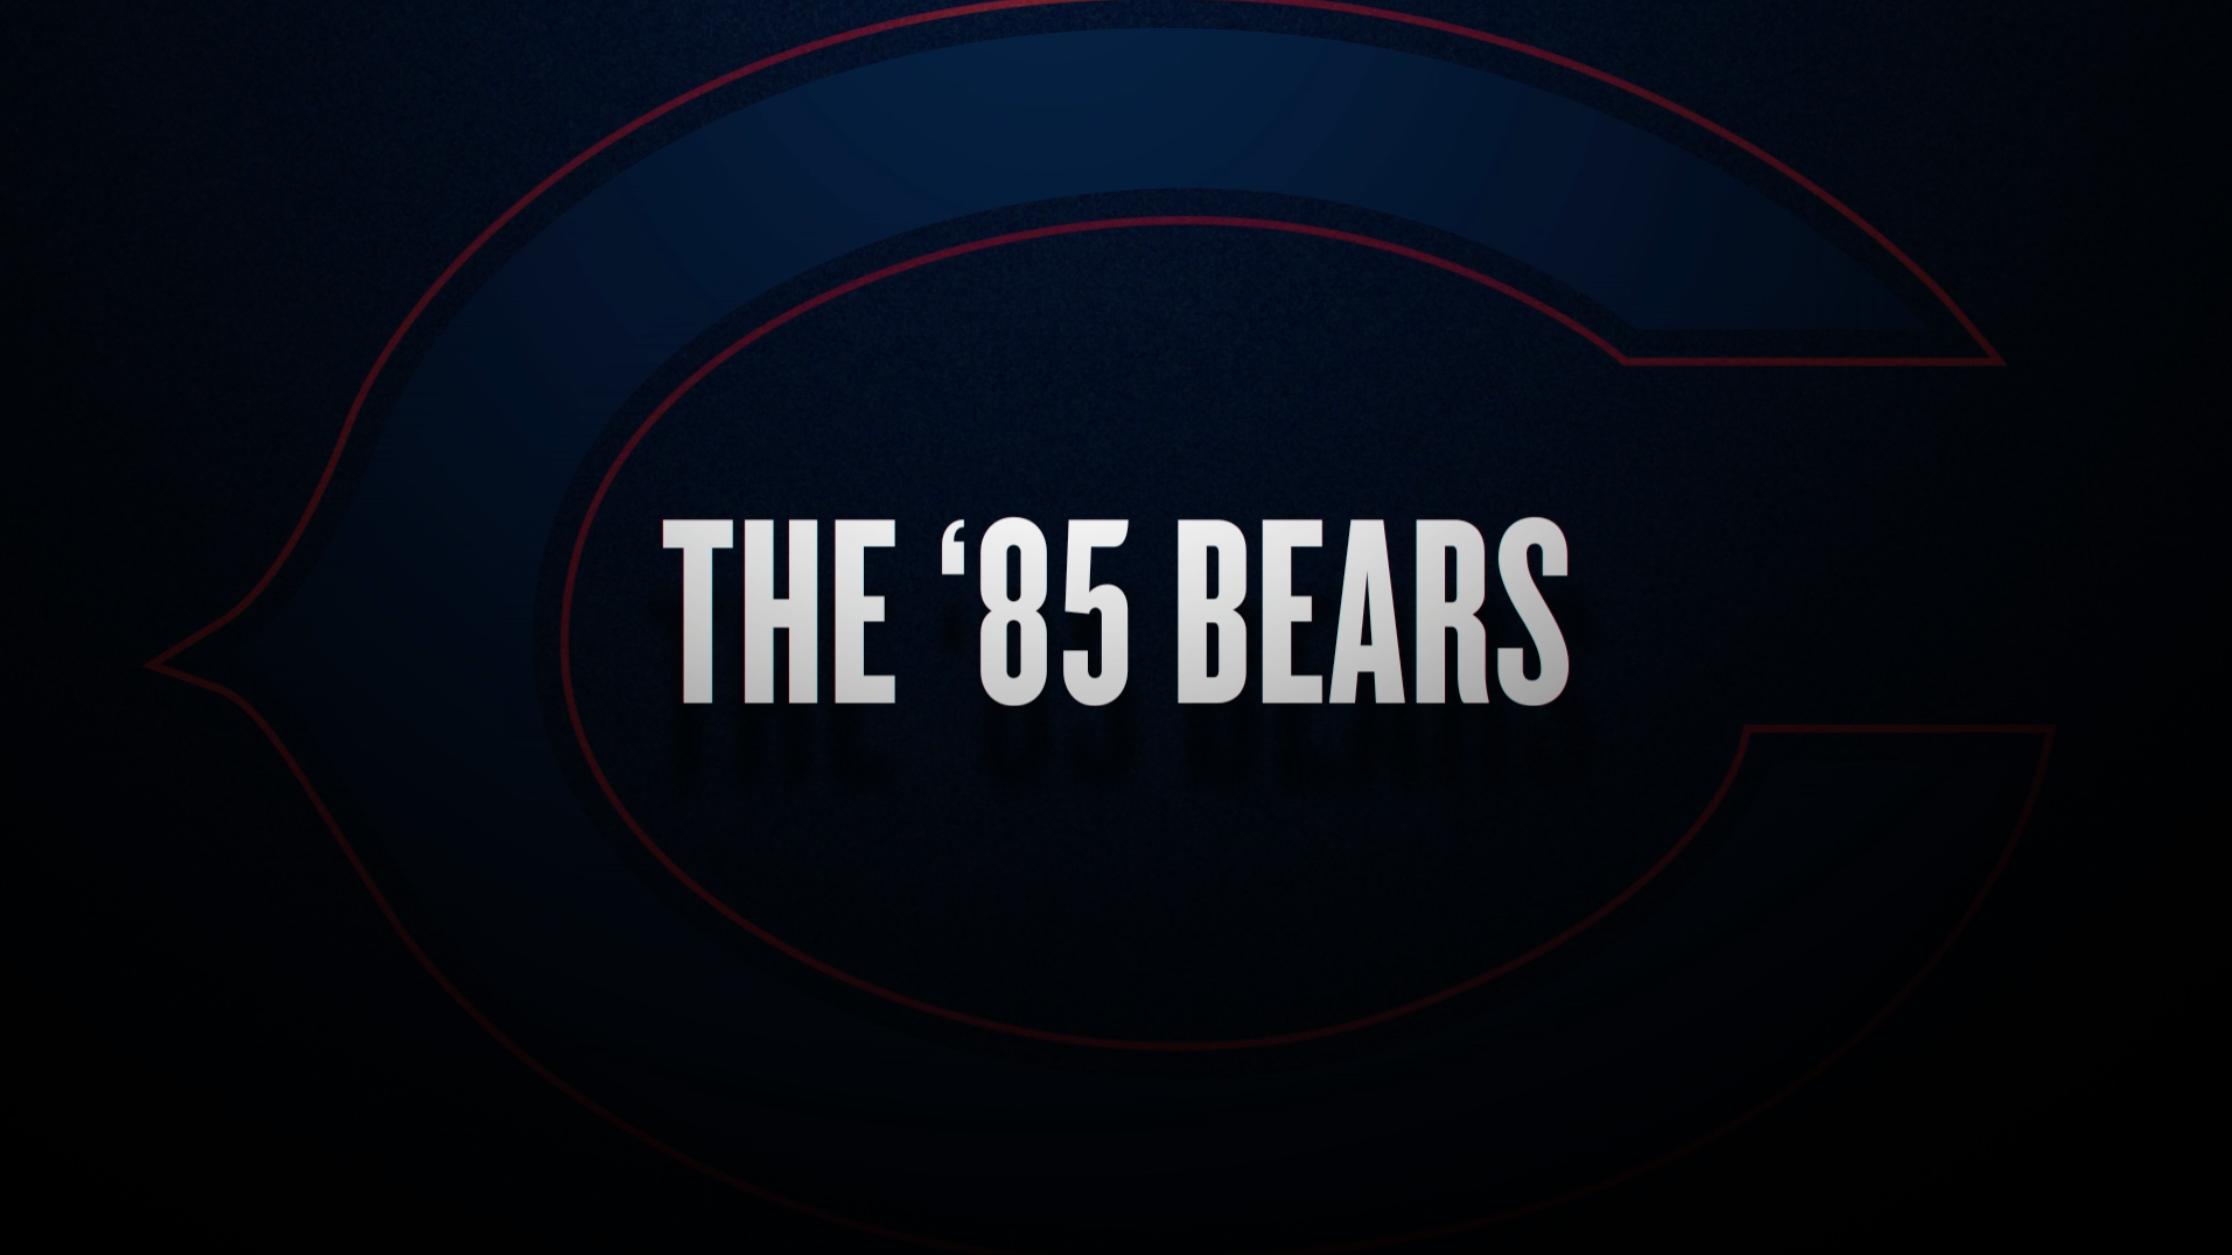 ESPN 30 FOR 30: THE '85 BEARS